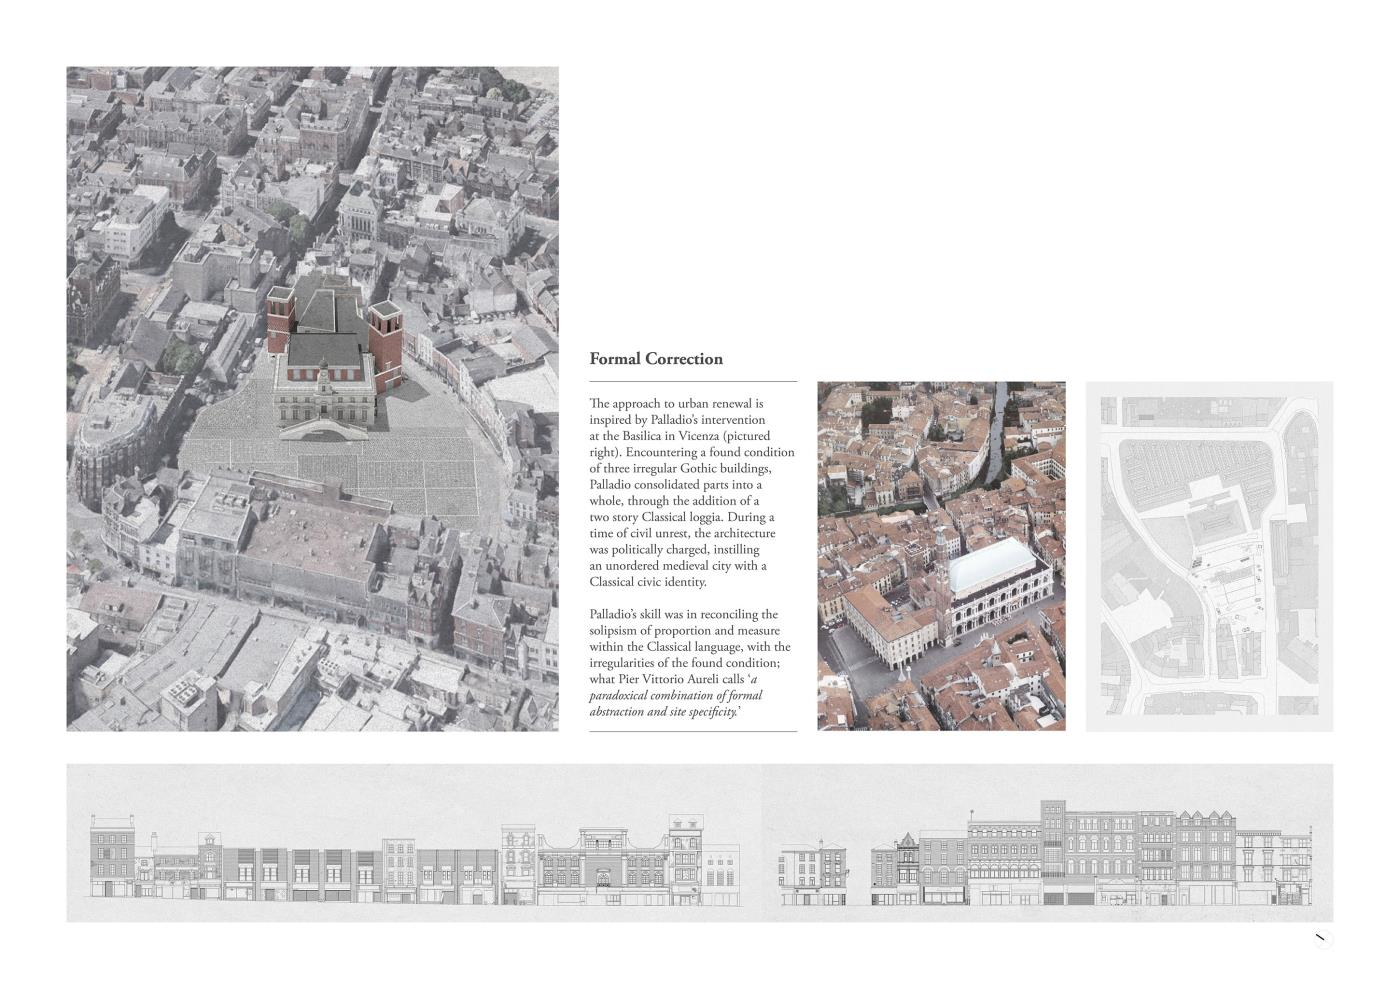 Semper Eadem: A New Public Building for Leicester